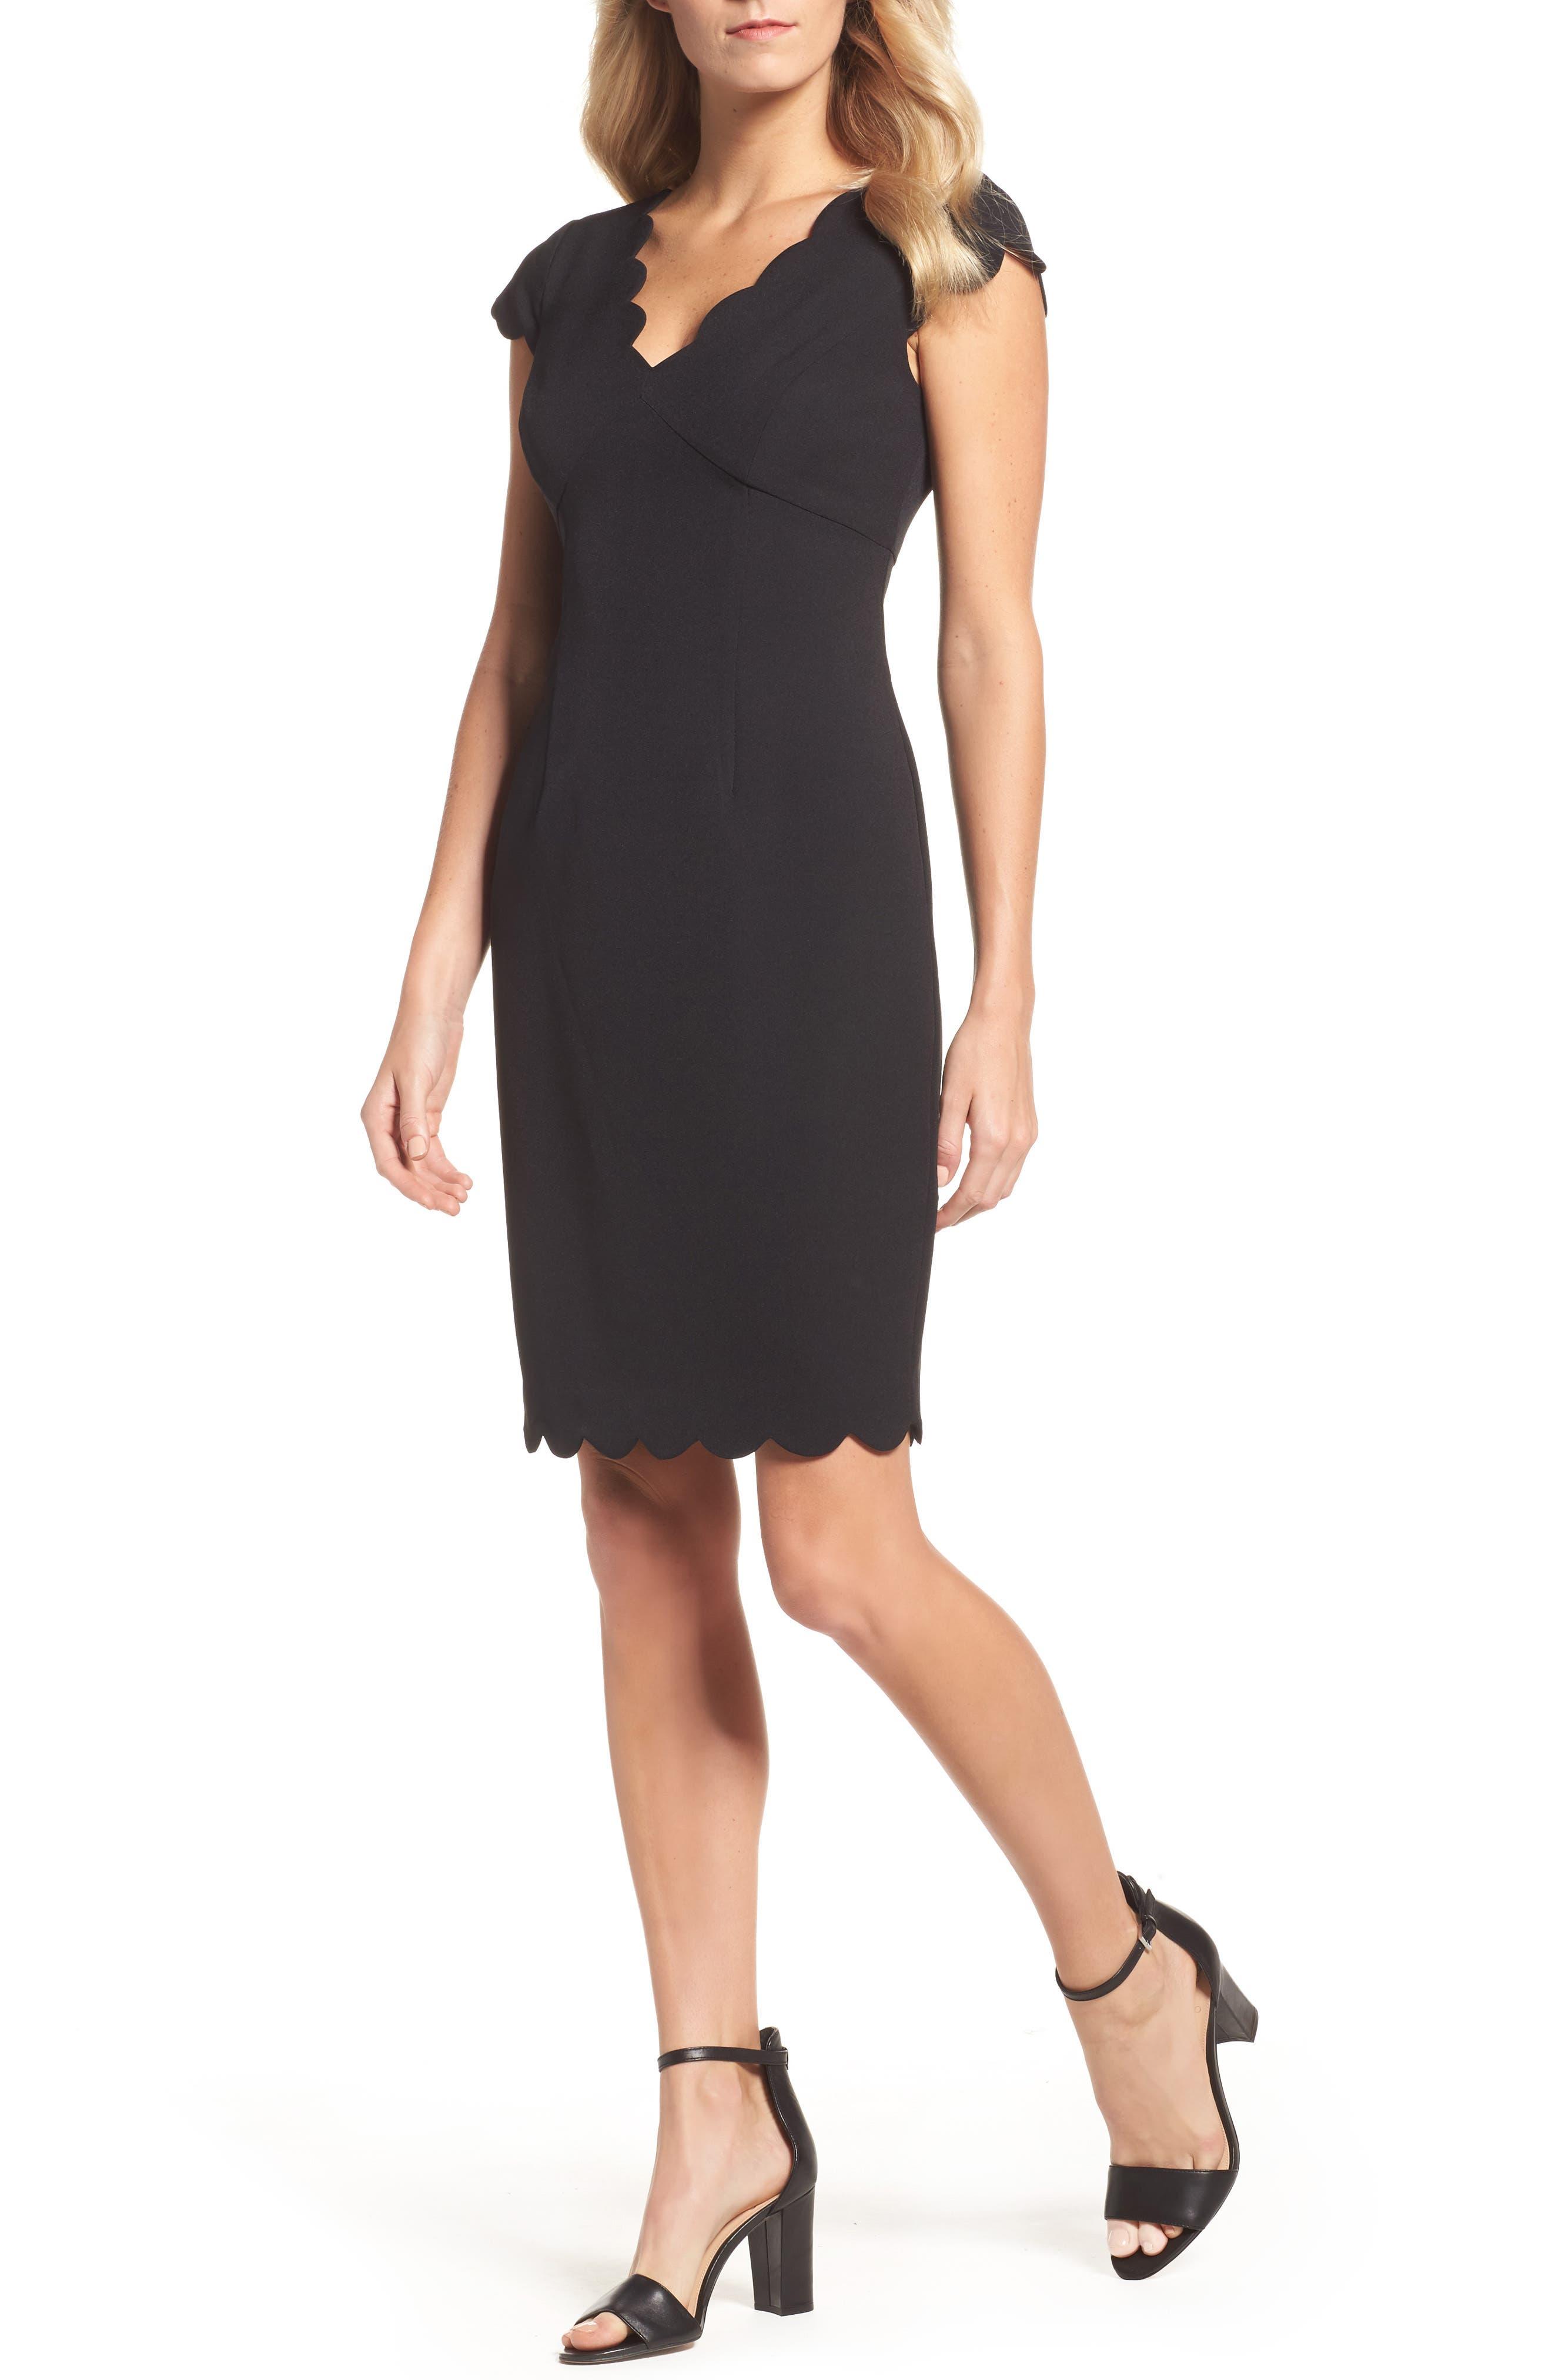 ADRIANNA PAPELL,                             Scalloped Crepe Sheath Dress,                             Main thumbnail 1, color,                             001